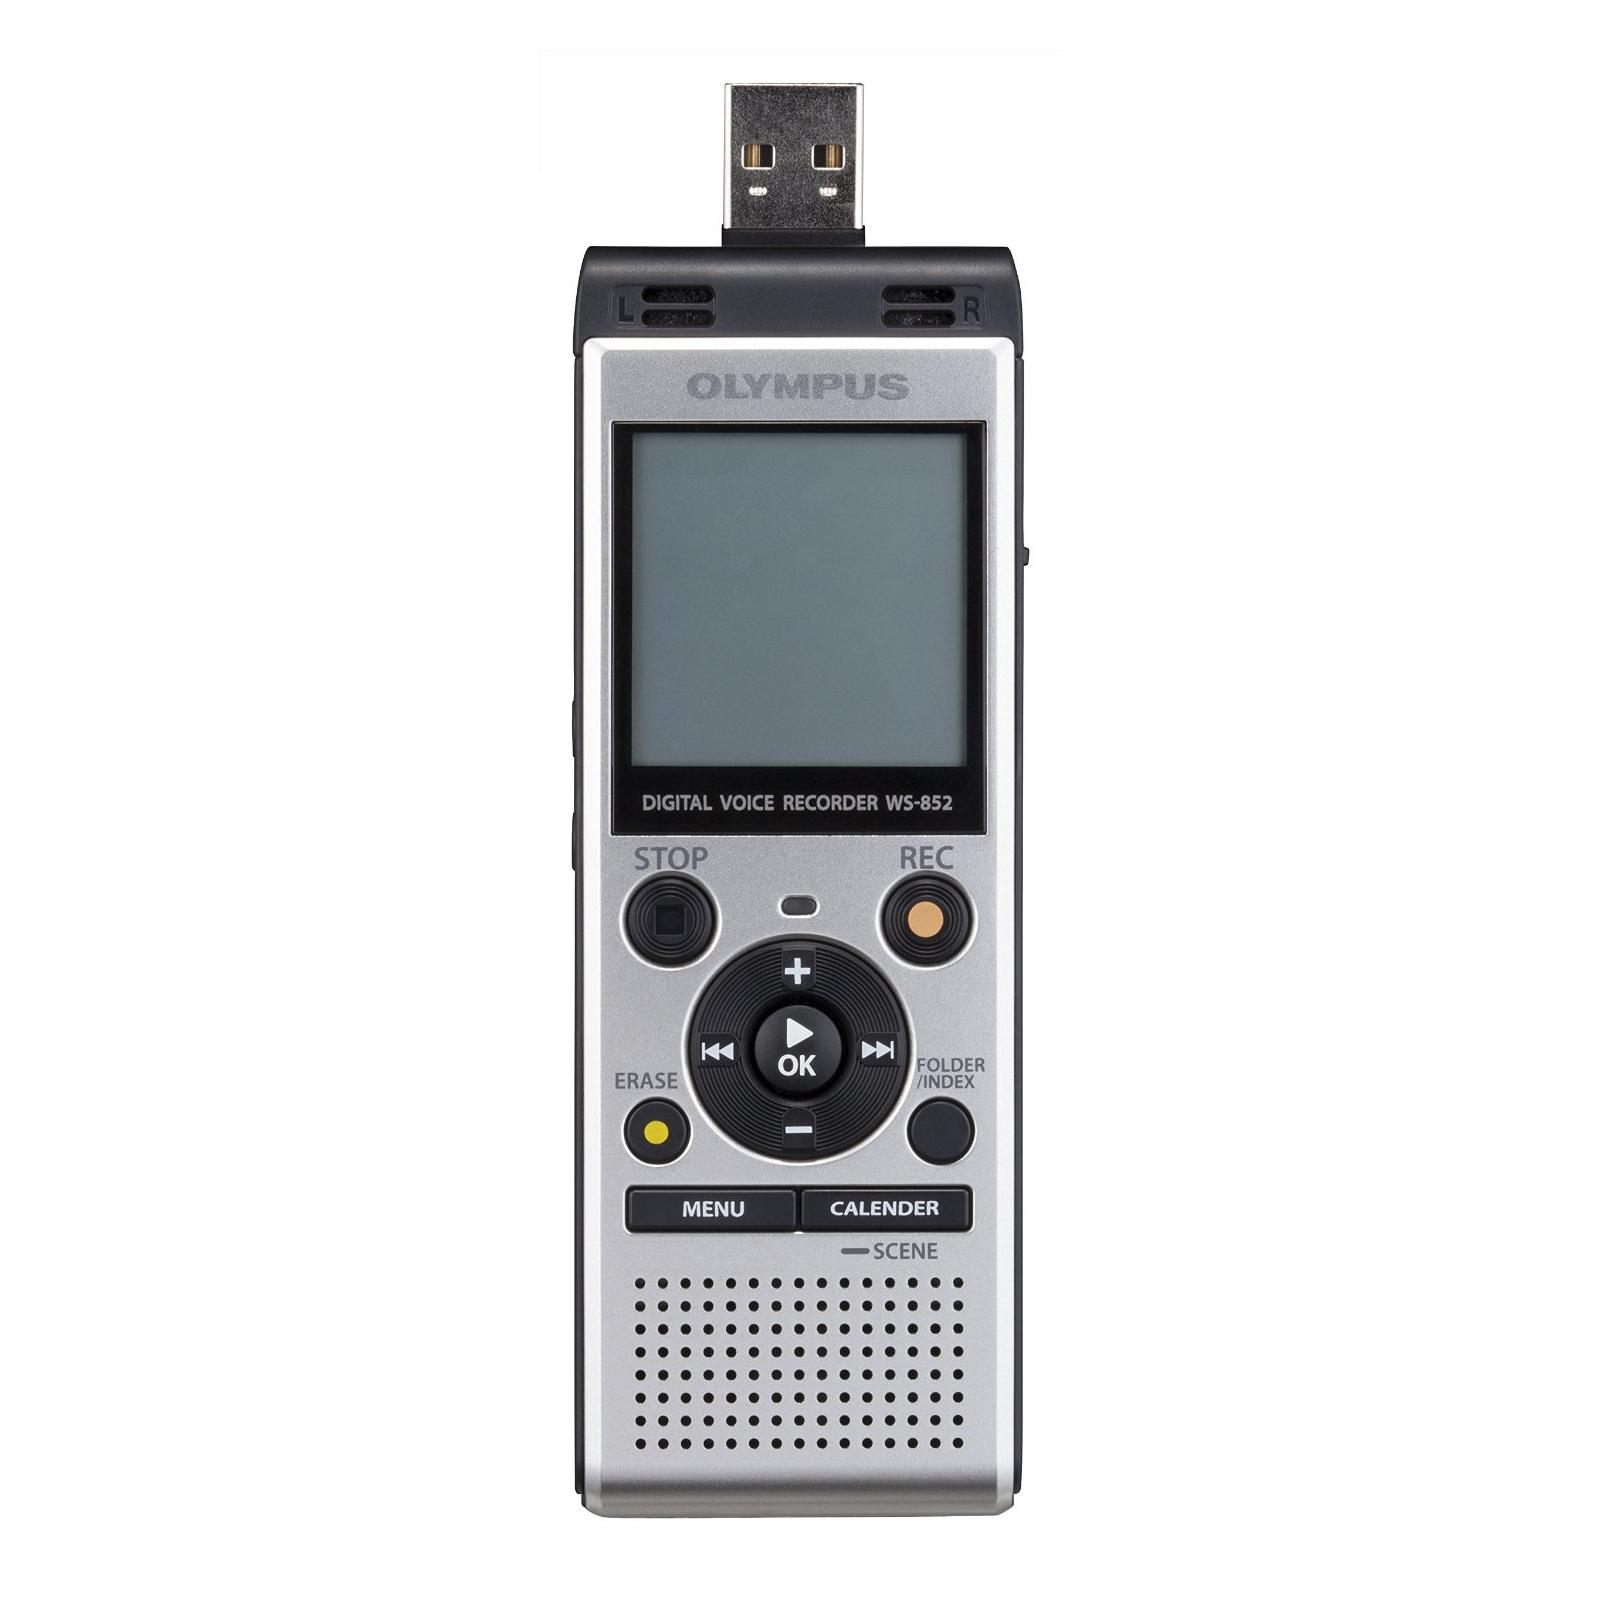 Цифровой диктофон OLYMPUS WS-852 4GB Silver (V415121SE000) изображение 8